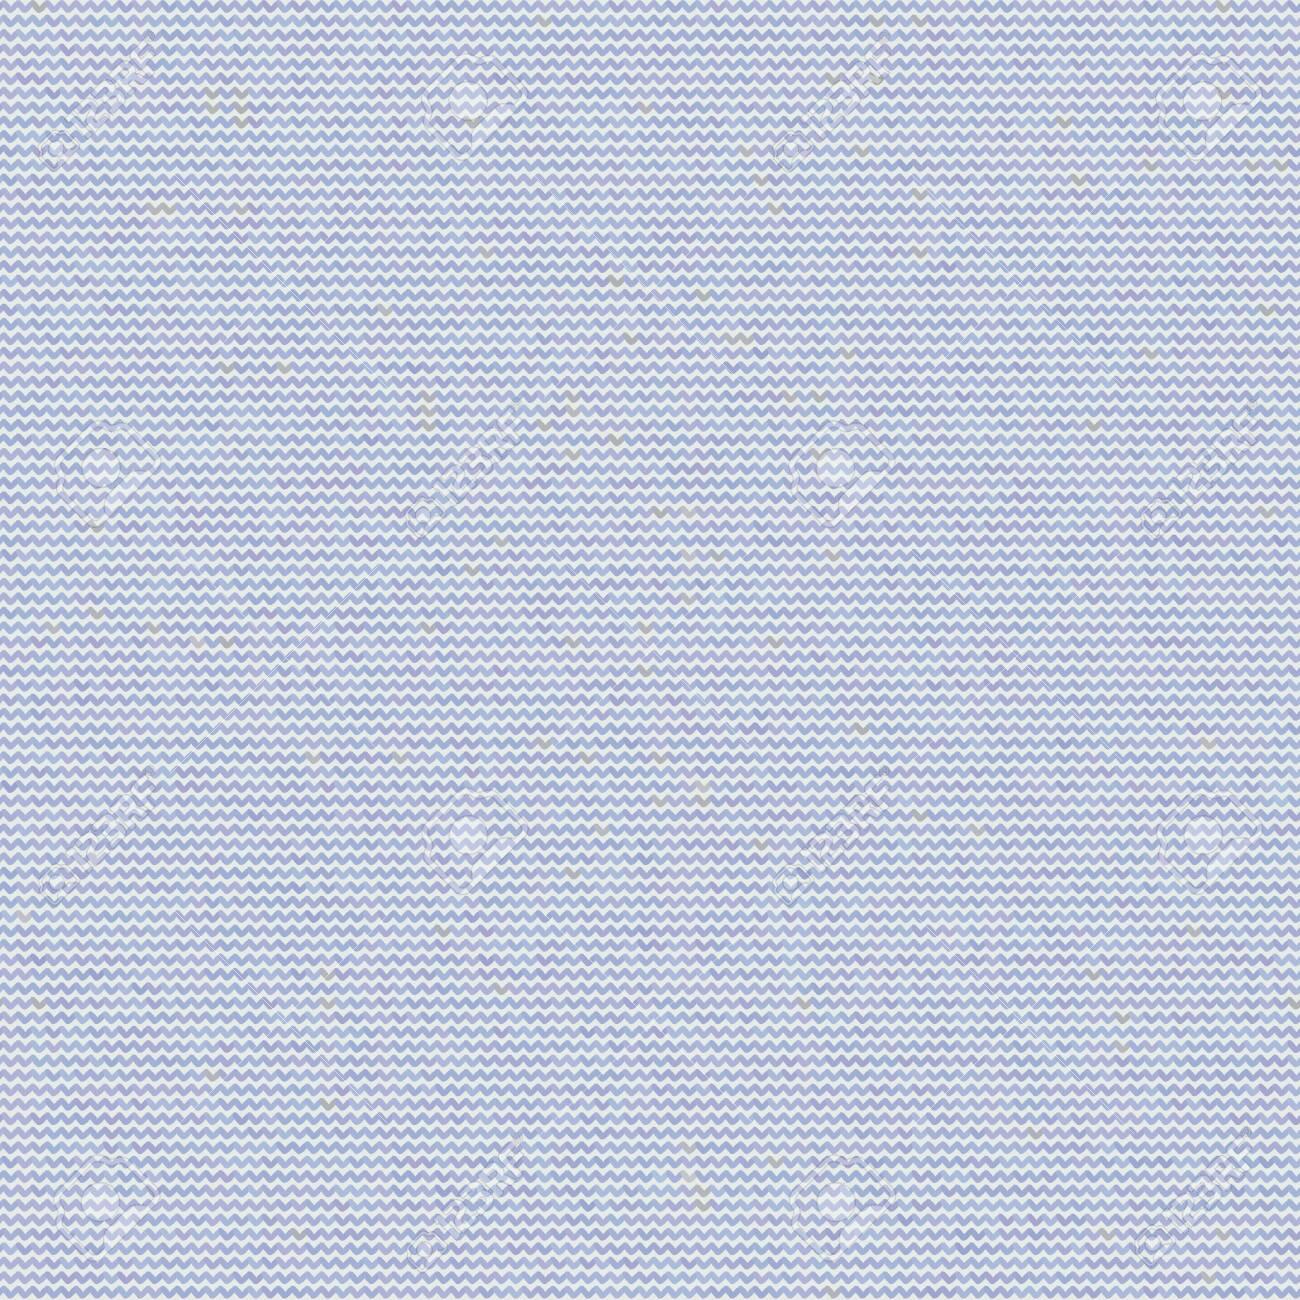 Gray Marl Blanket Knit Stitch Seamless Pattern. Homespun Handicraft Background. For Woolen Fabric, Cute Gender Neutral Grey Textile. Soft Monochrome Yarn Melange Scandi All Over Print. - 135273136